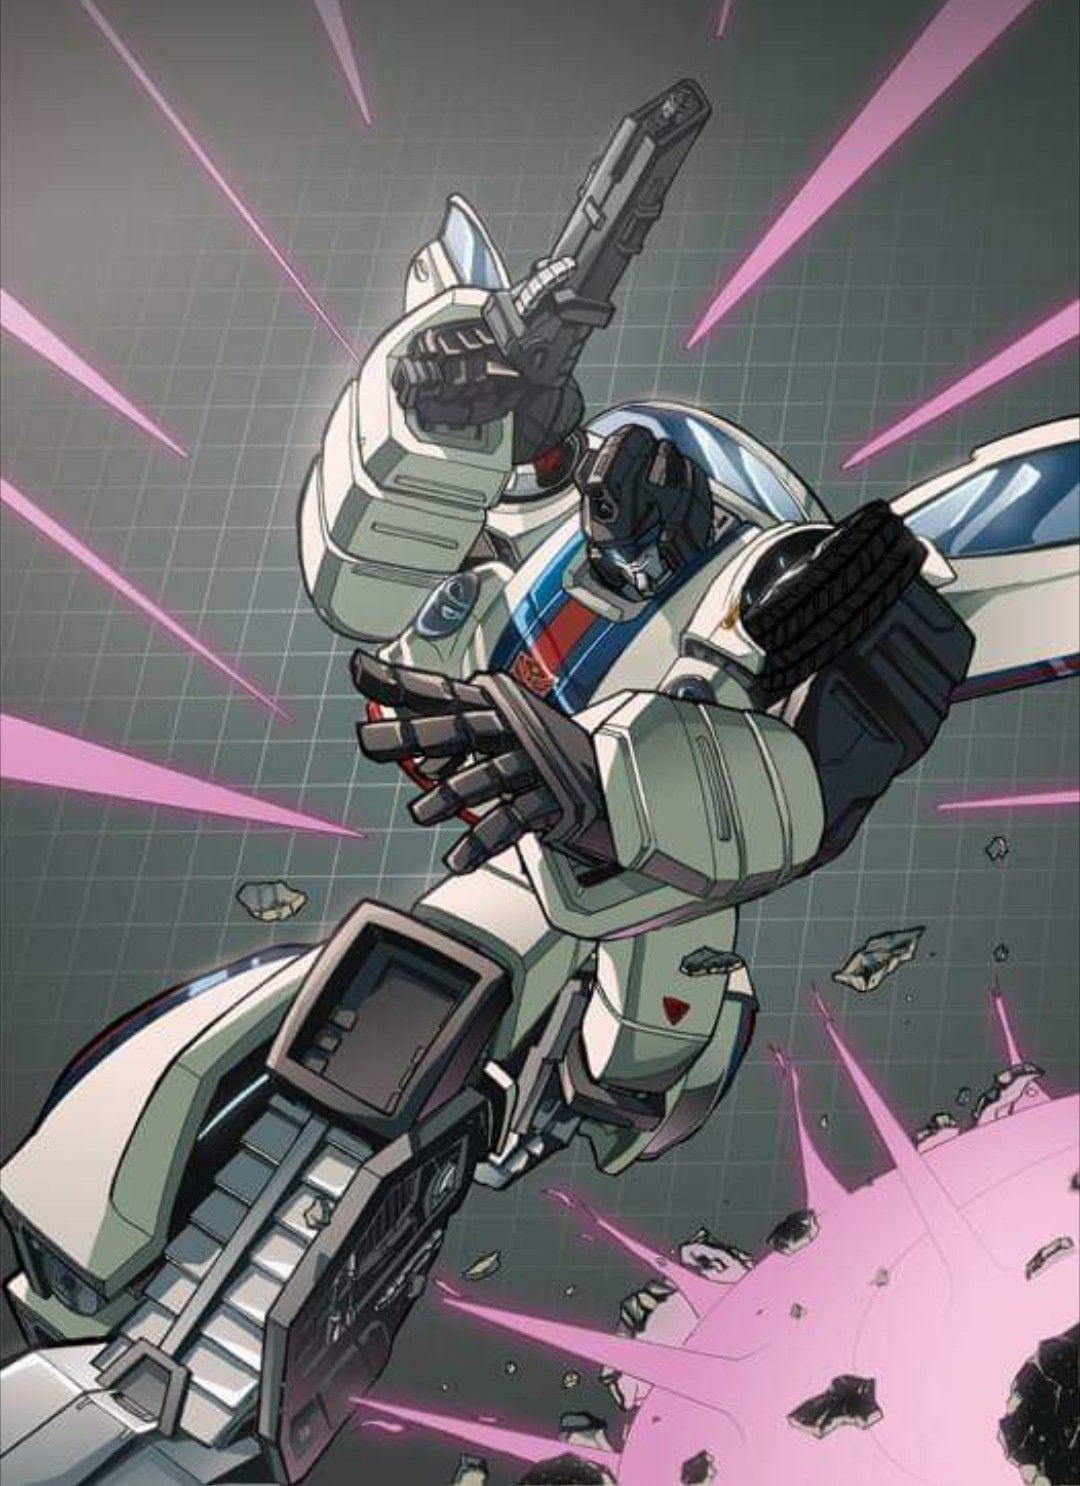 Pin By Billy Daniel On Nerd Transformers Art Transformers